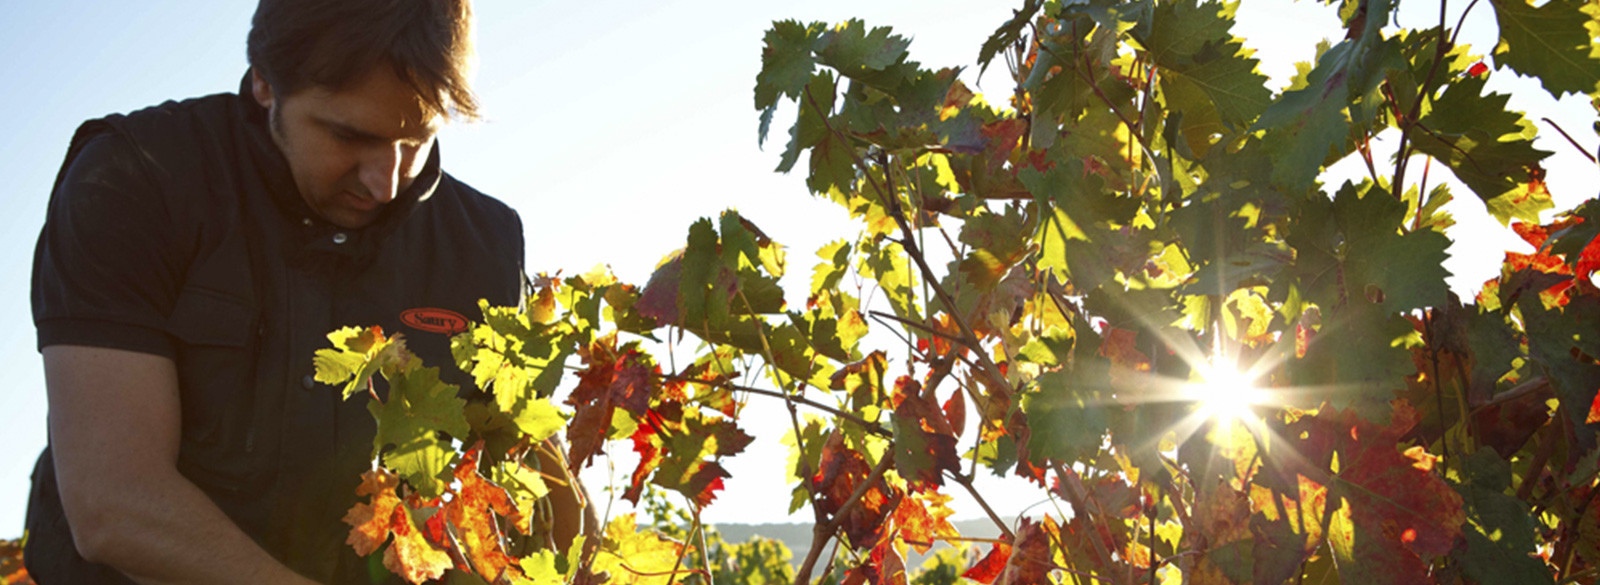 Tom Puyaubert: Aire fresco y rock'n'roll en Rioja